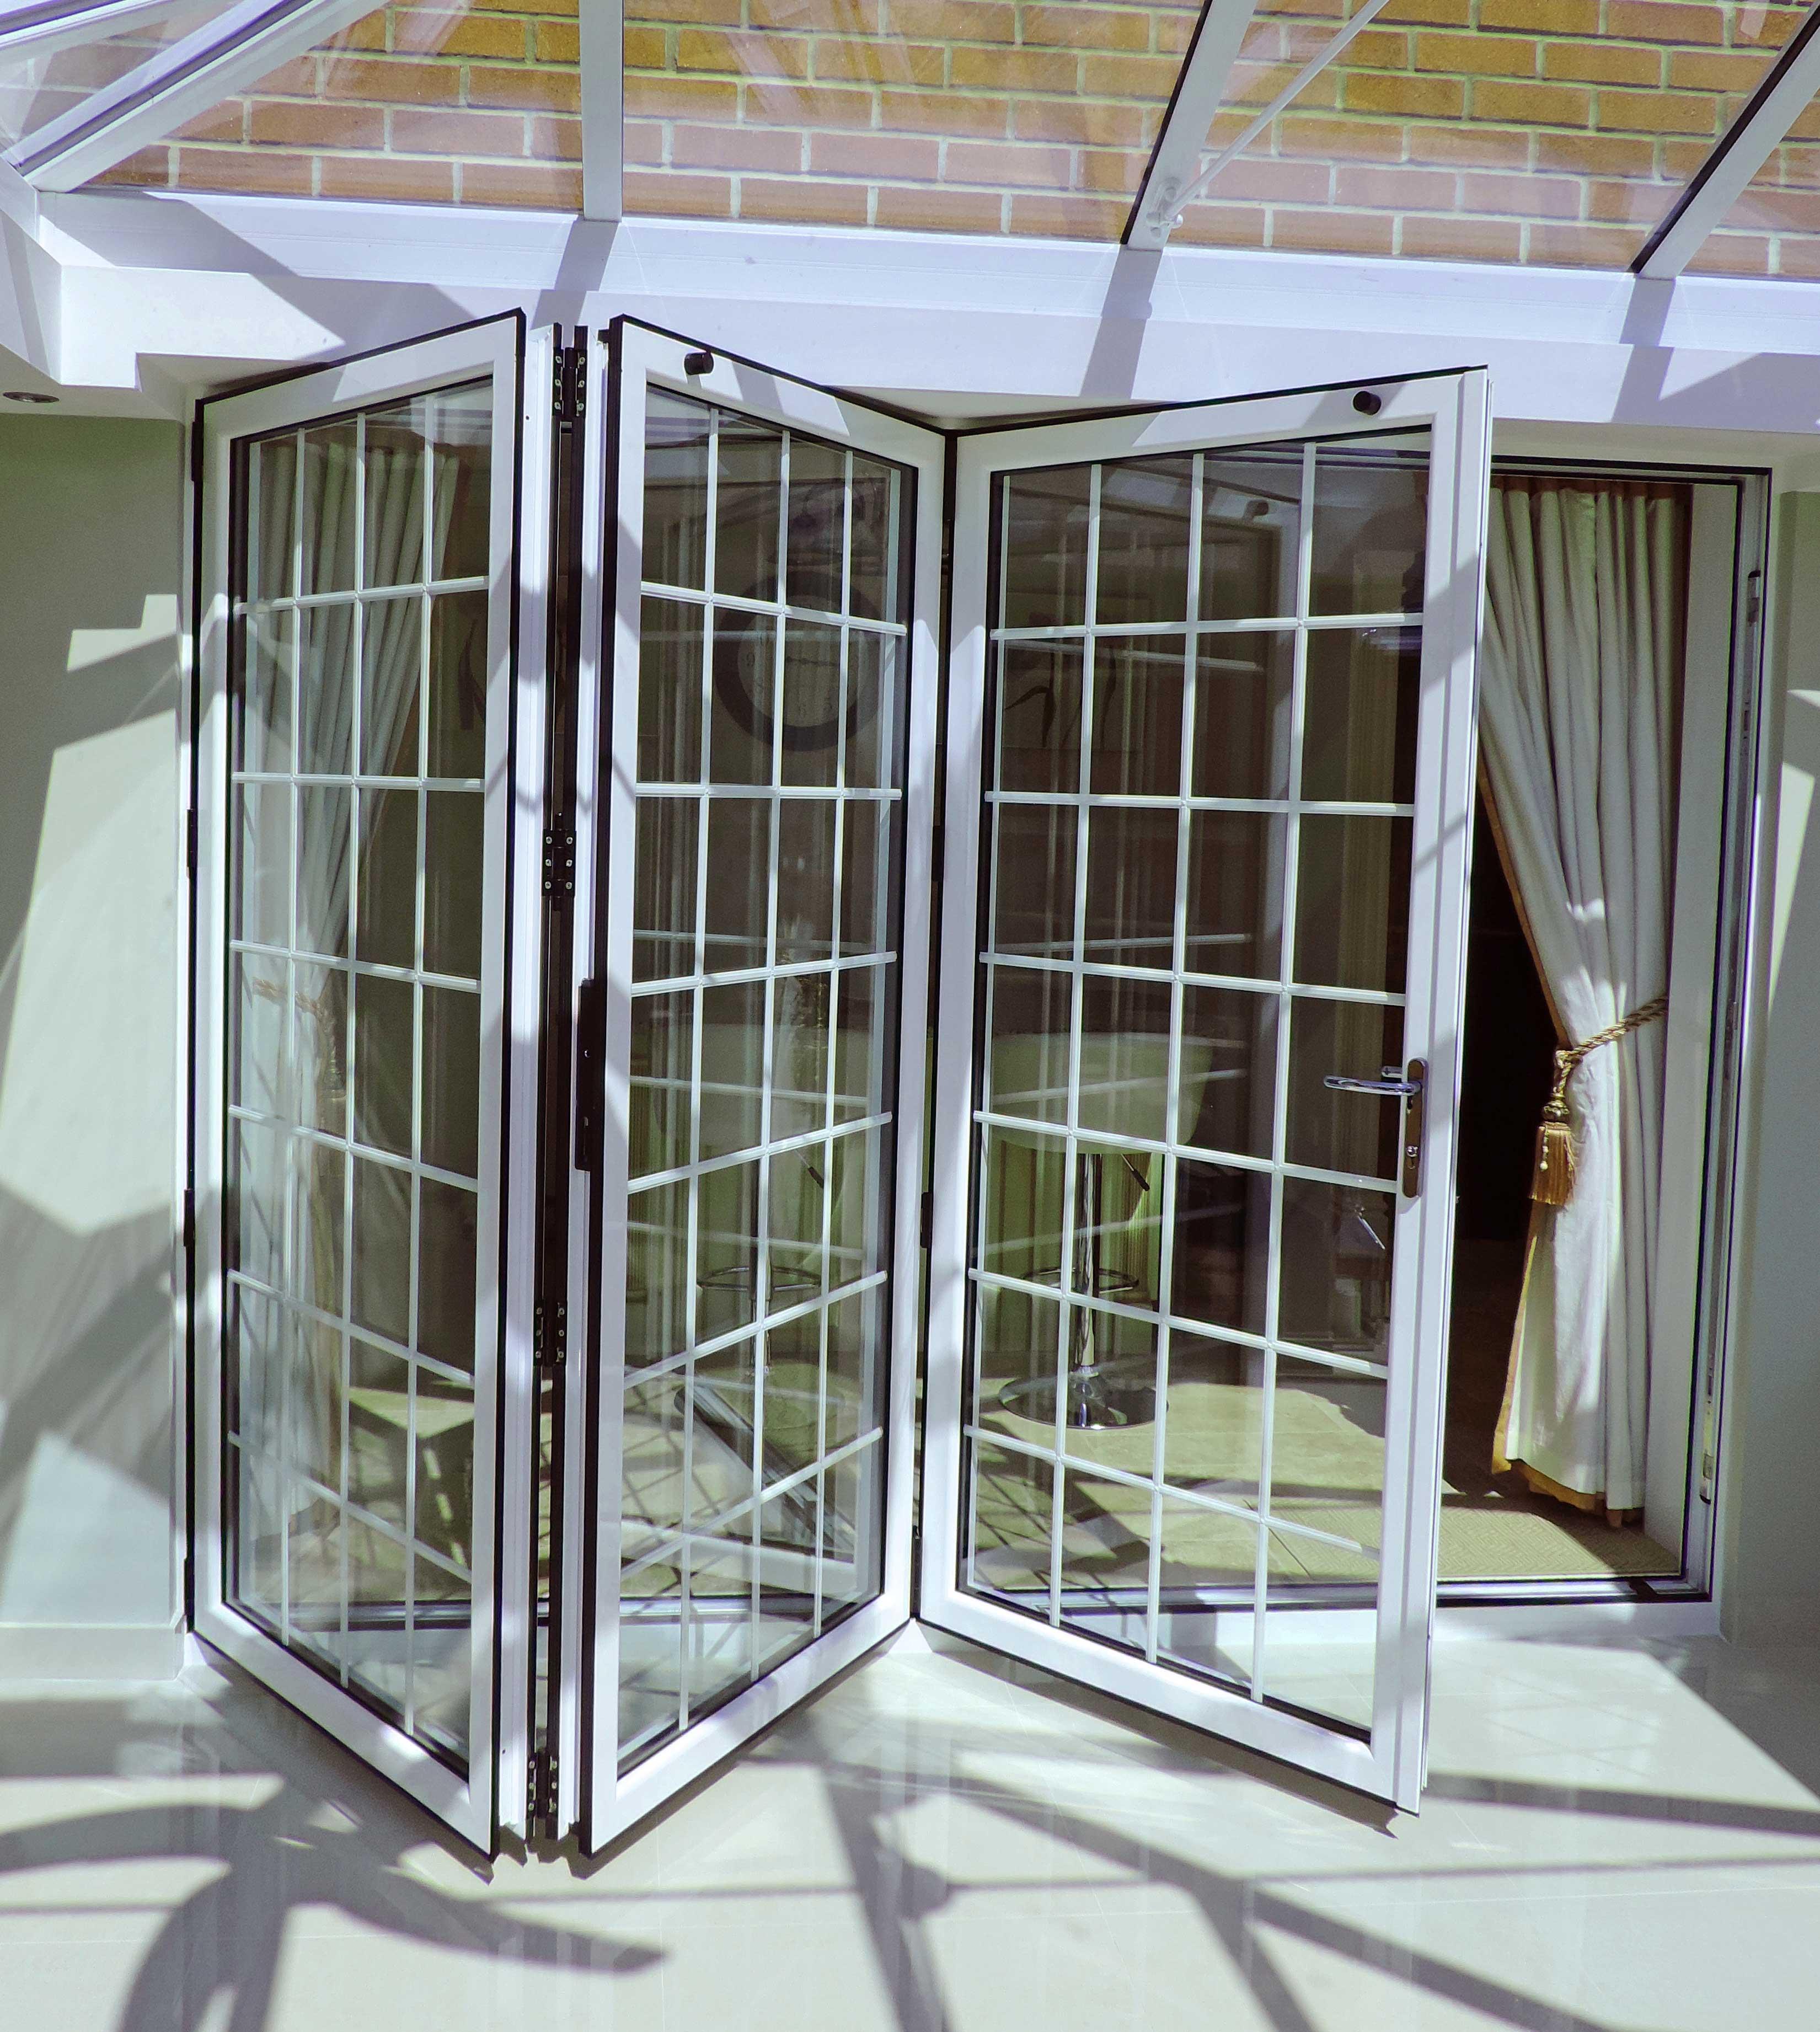 Orangery and Bi-Fold Doors in White